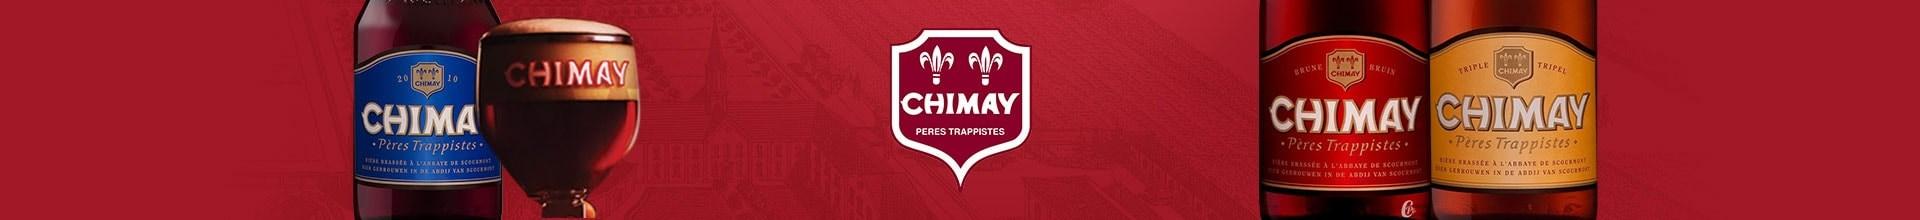 Cervejaria Chimay